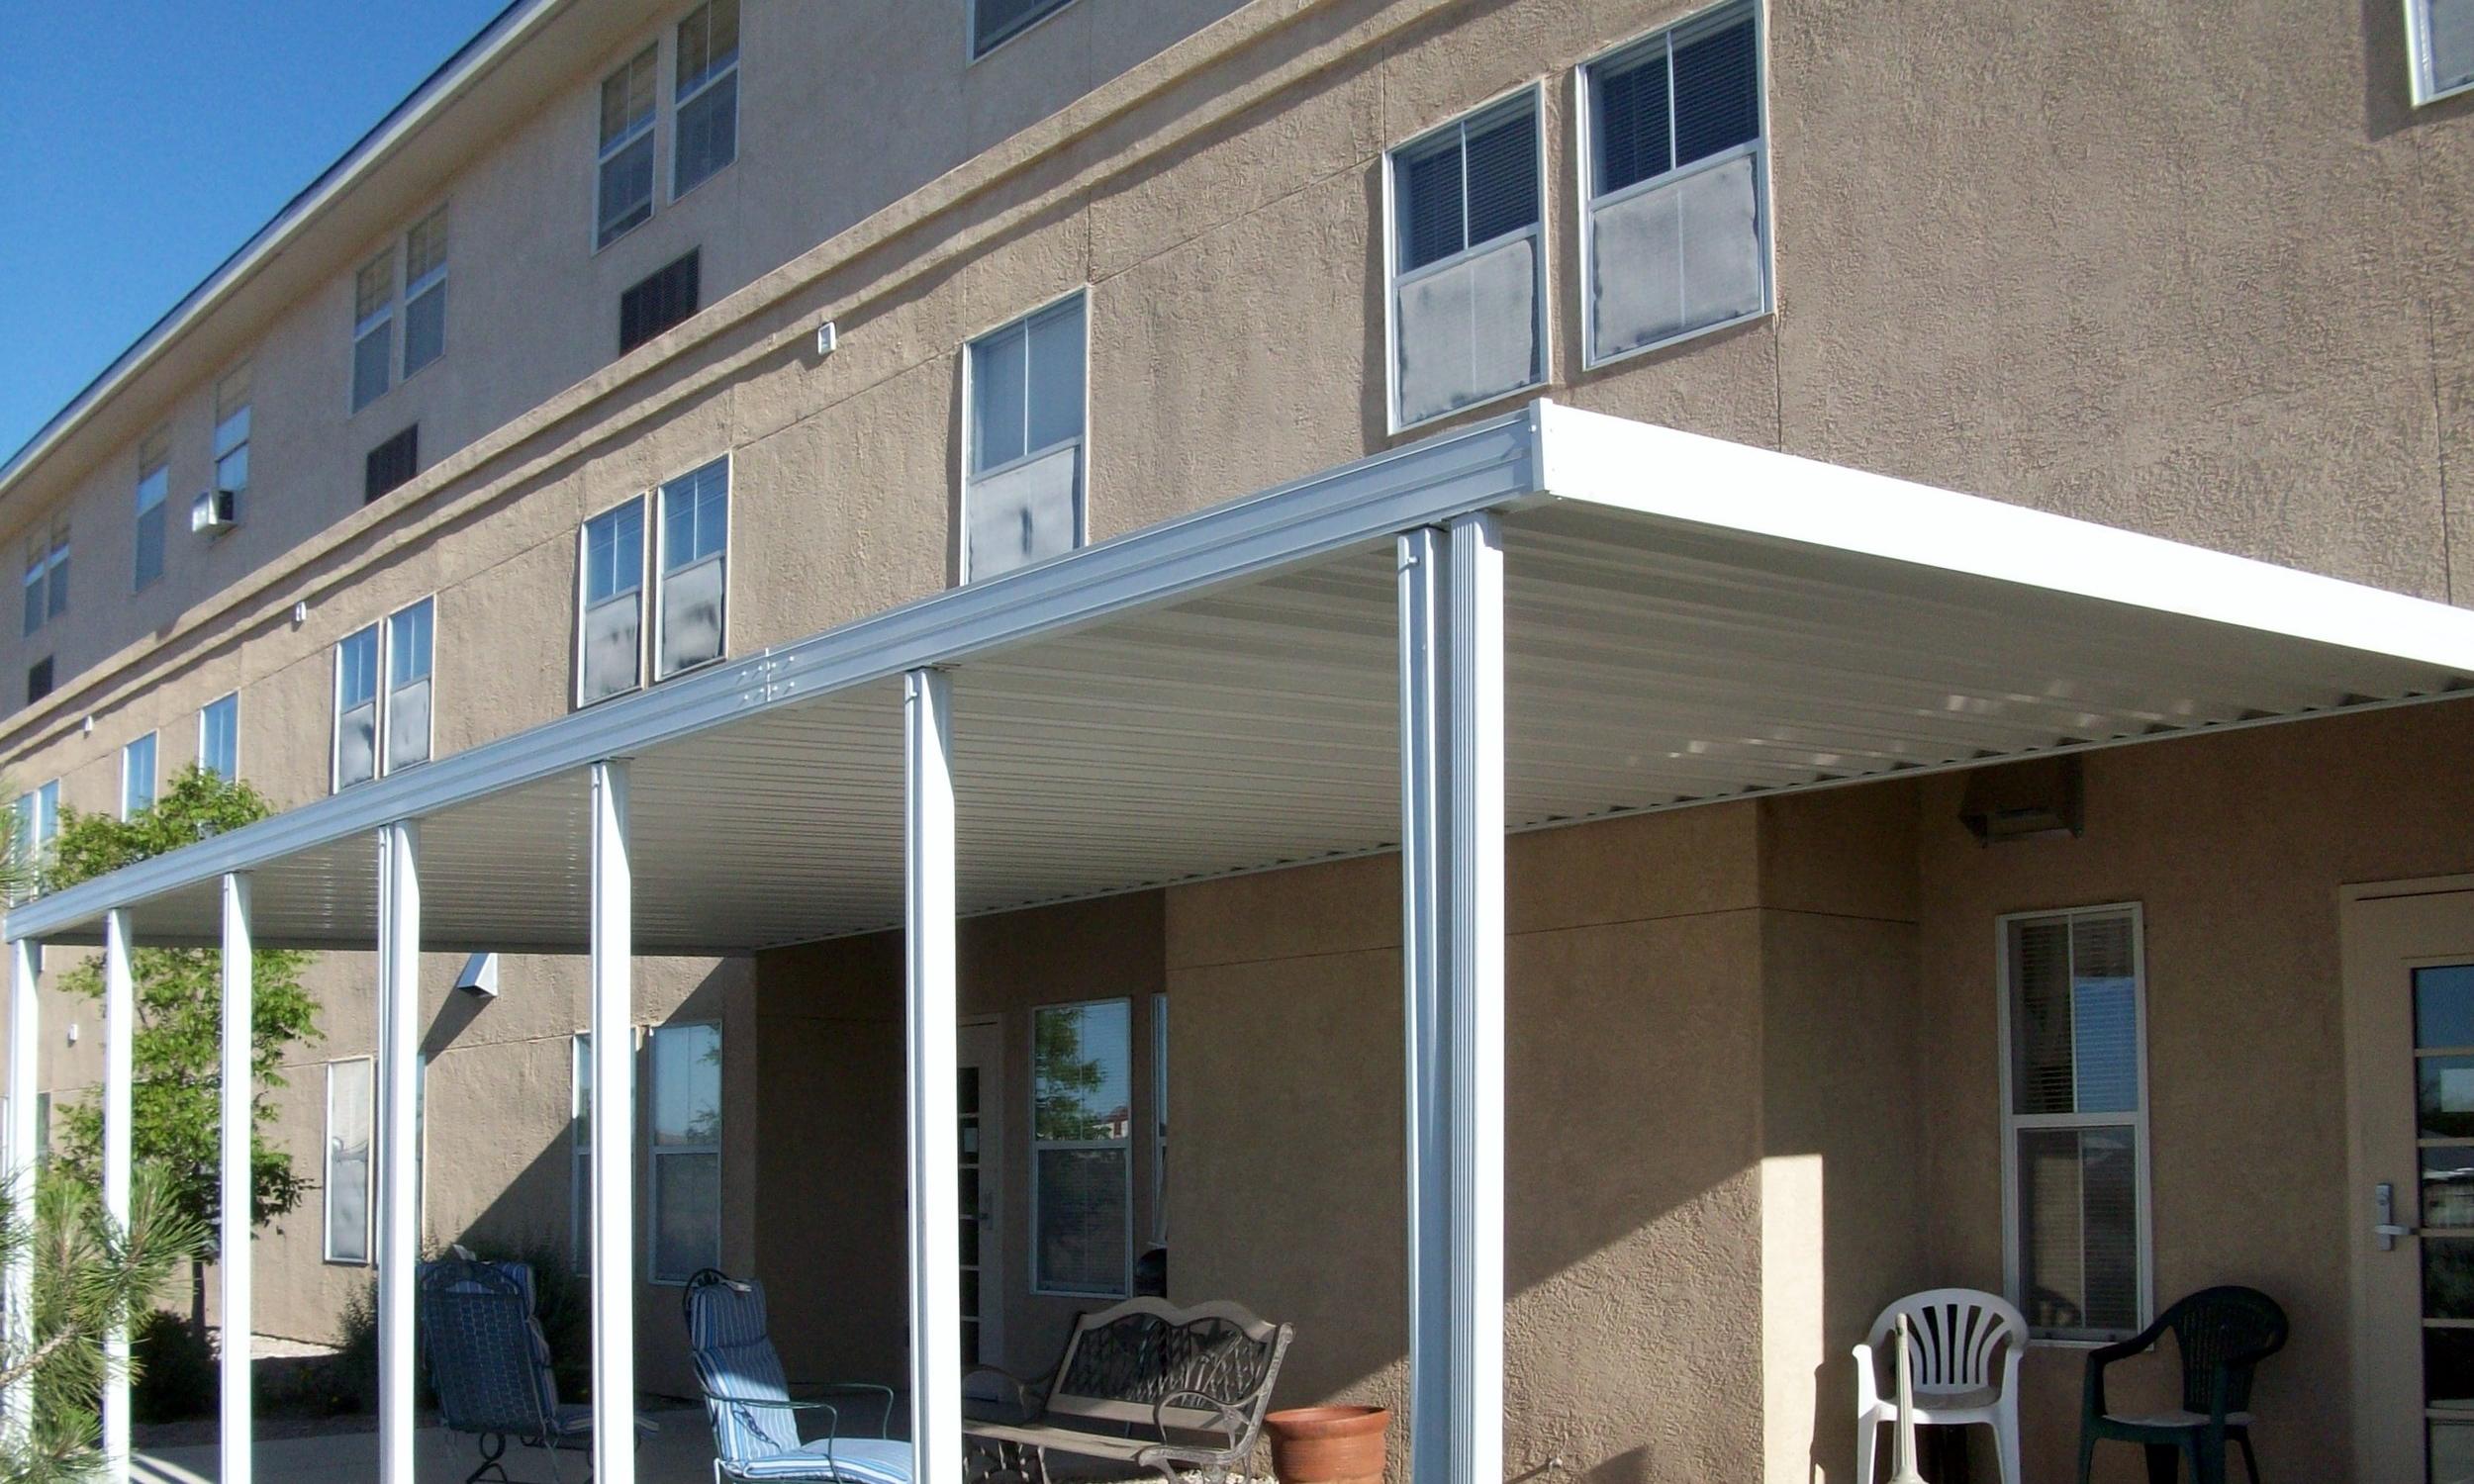 AHEPA 501 III Senior Apartments - 6620 Bluewater Road NWAlbuquerque, NM 87121(505) 839-9487TTY: (800) 659-8331 or 711 (English)TTY: (800) 327-1857 or 711 (Español)info@ahepahousing.org